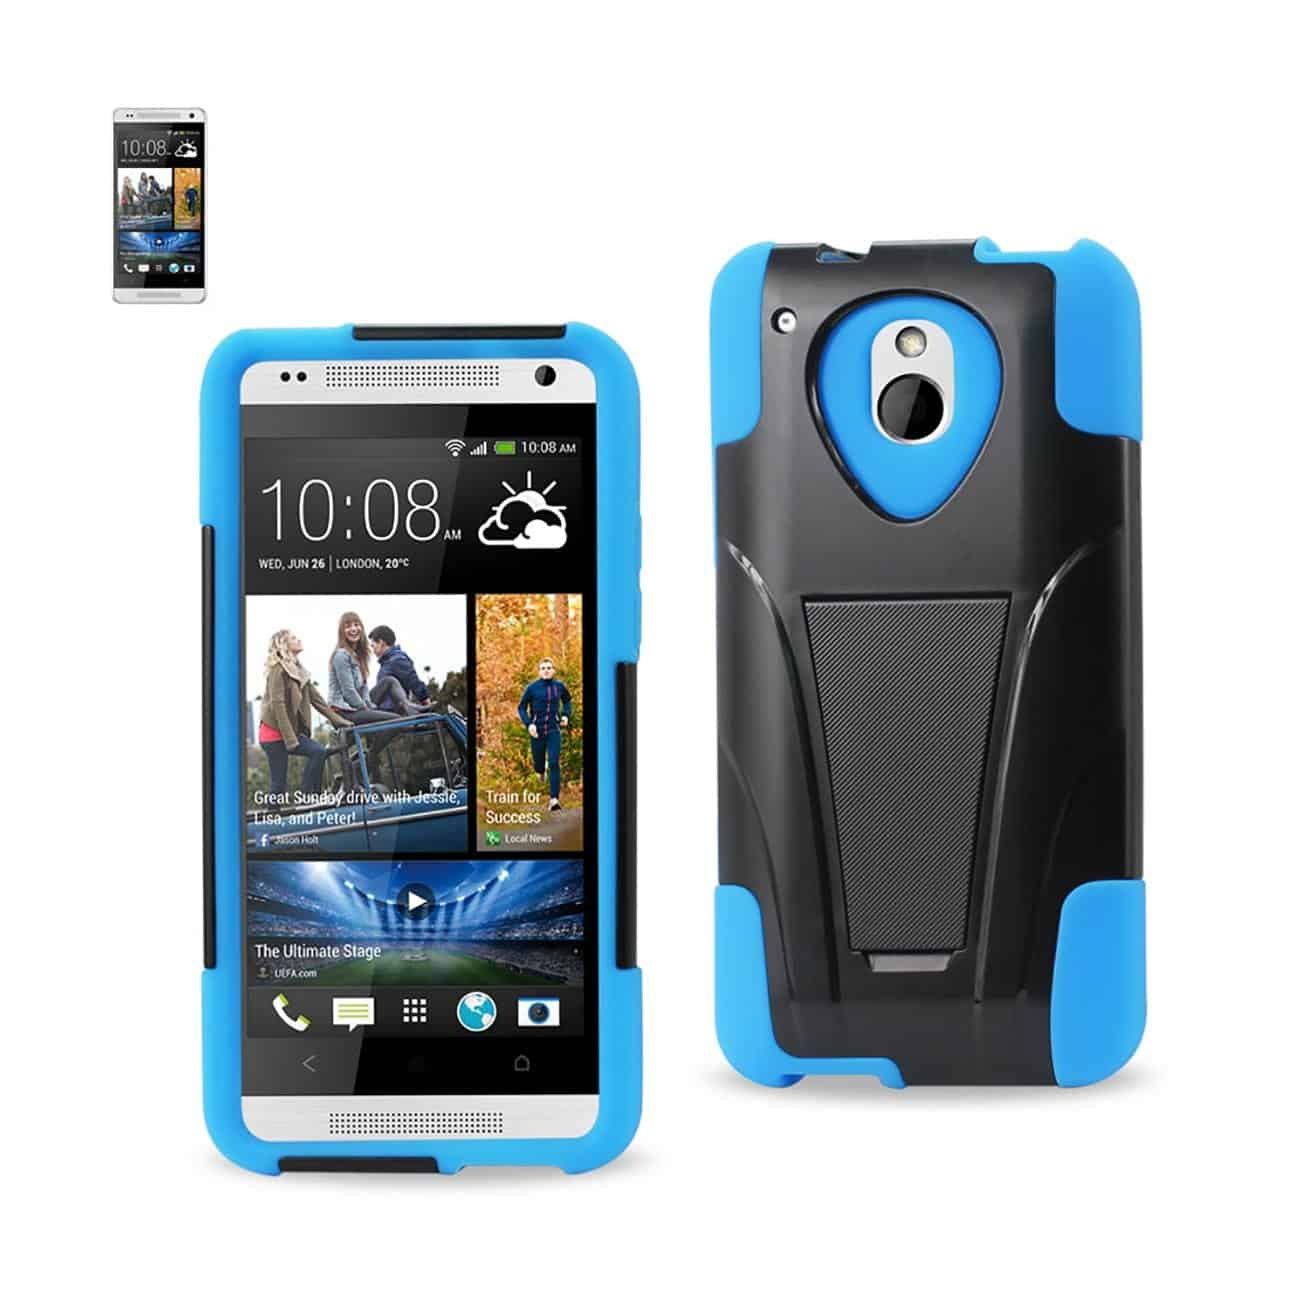 HTC ONE MINI M4 HYBRID HEAVY DUTY CASE WITH KICKSTAND IN NAVY BLACK